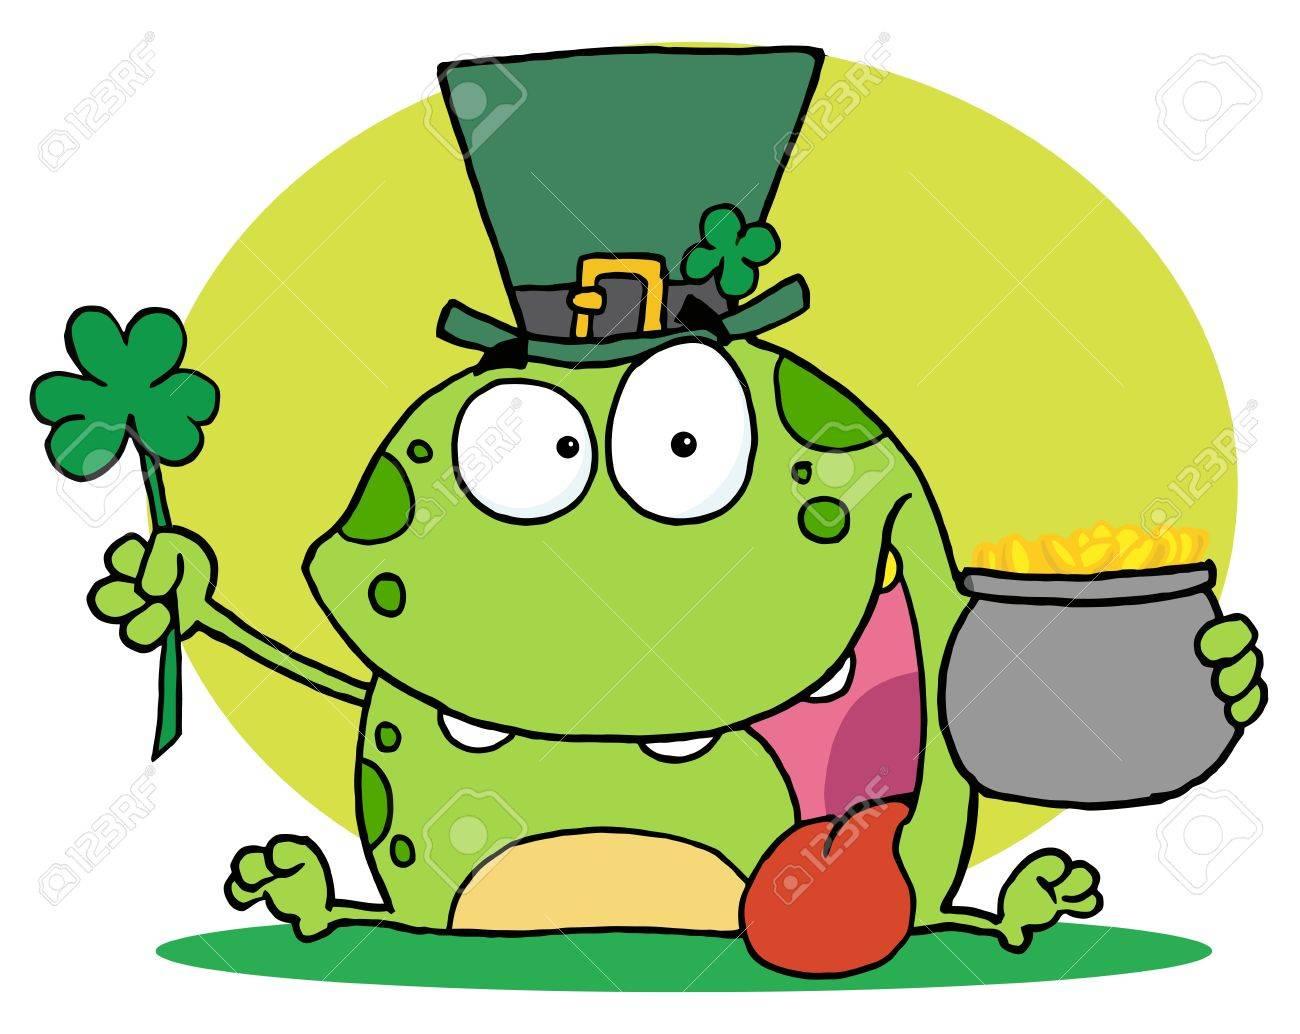 green st patricks day leprechaun frog wearing a hat holding